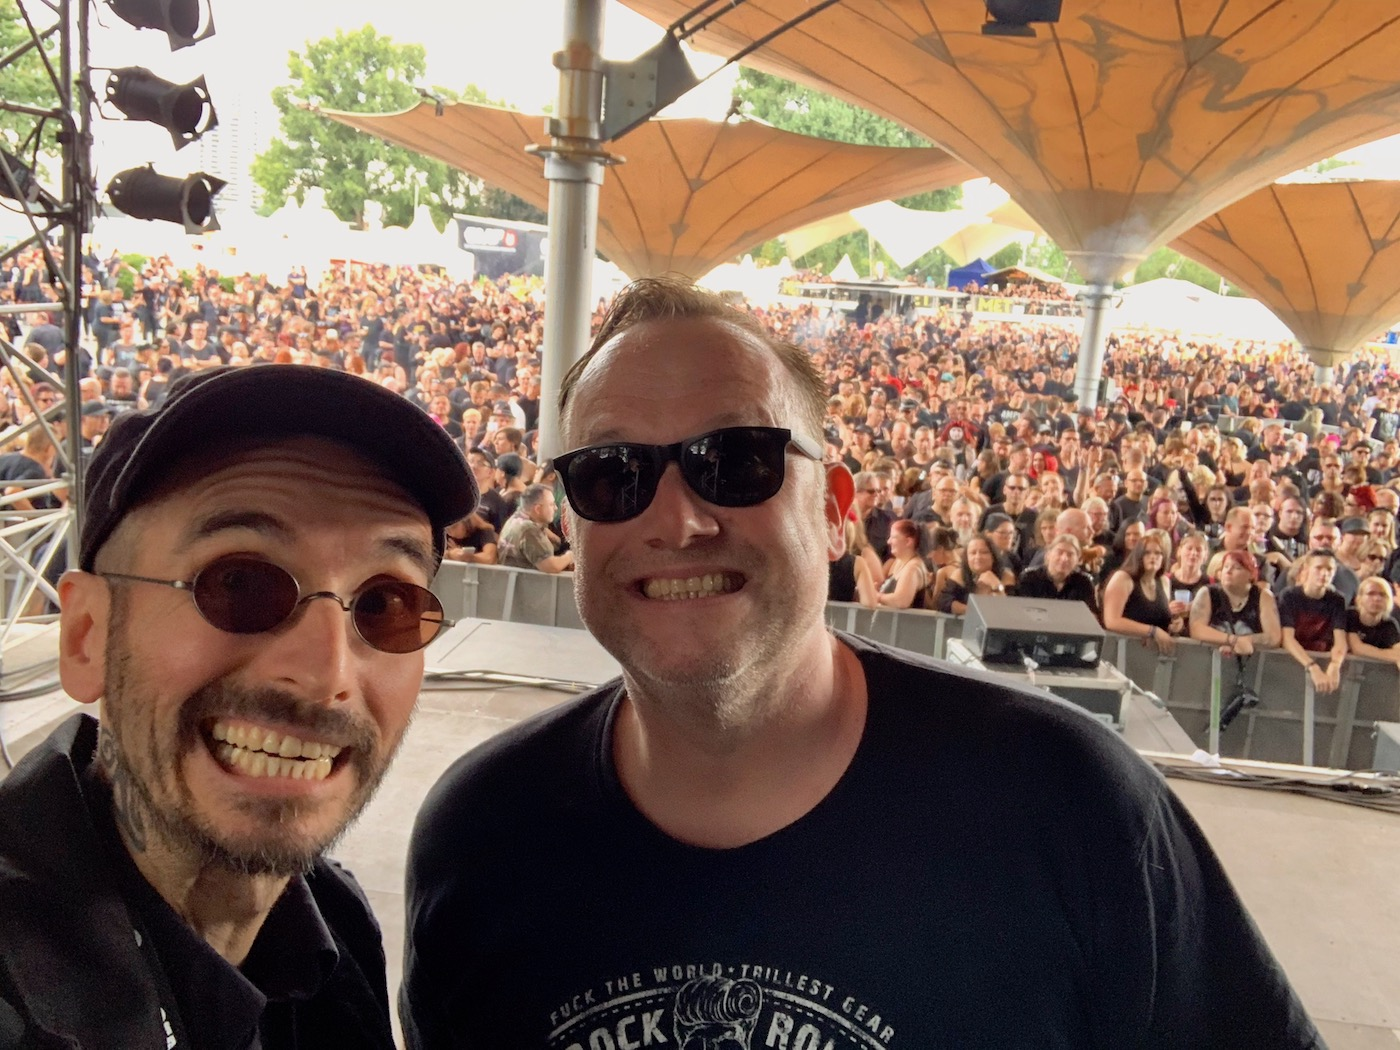 mark_benecke_amphi_festival_koeln_2019 - 27.jpg